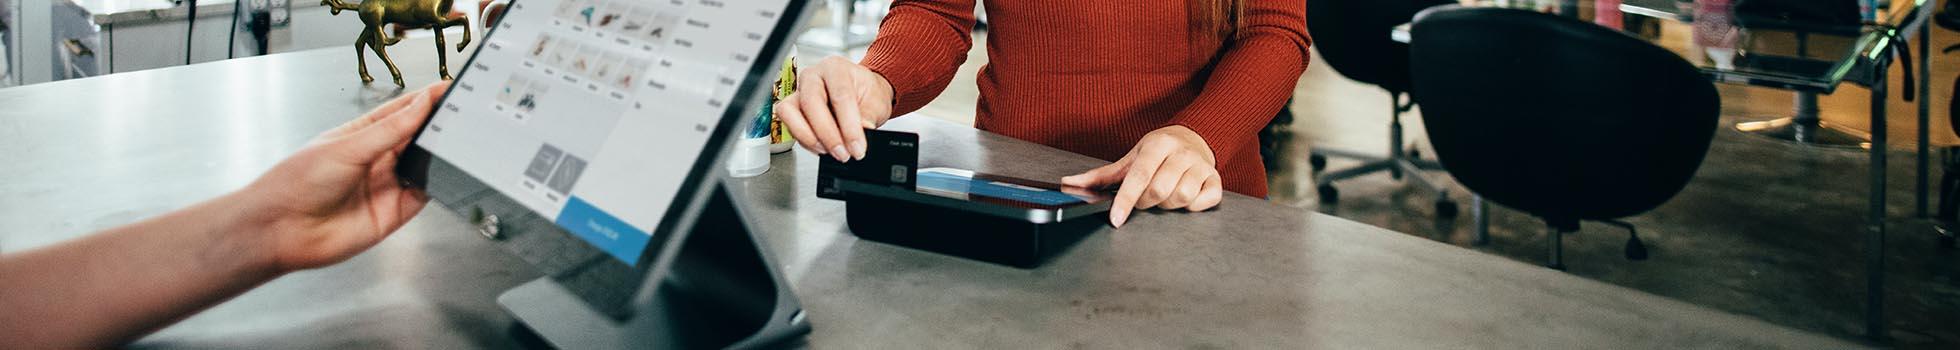 Woman swiping a credit card.